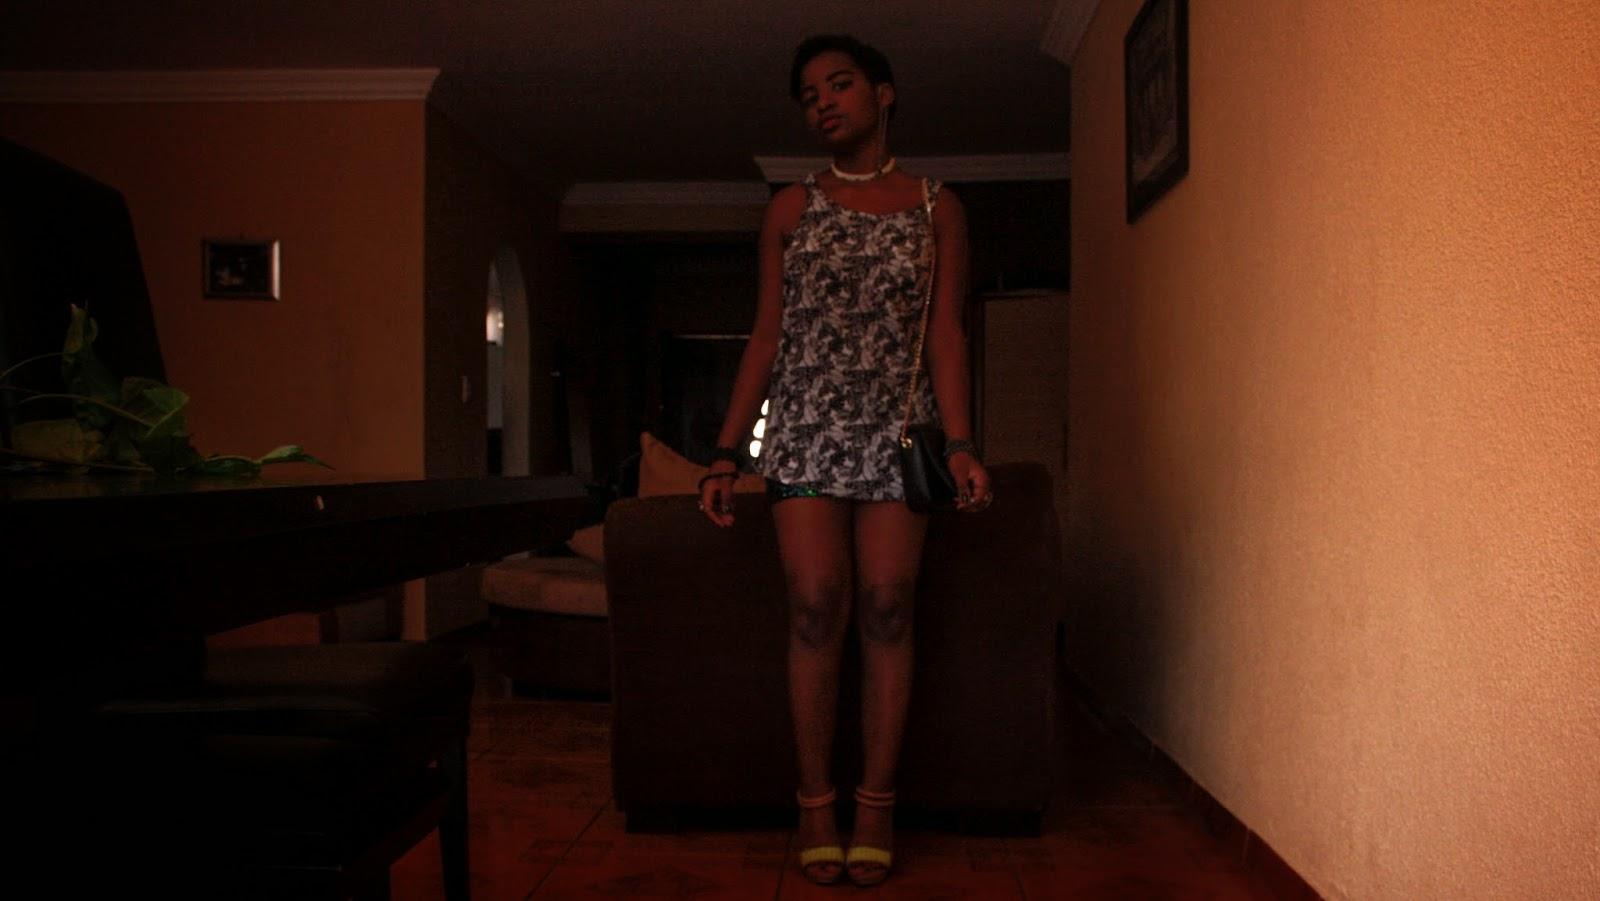 sixties mod pixie cut and shift dress